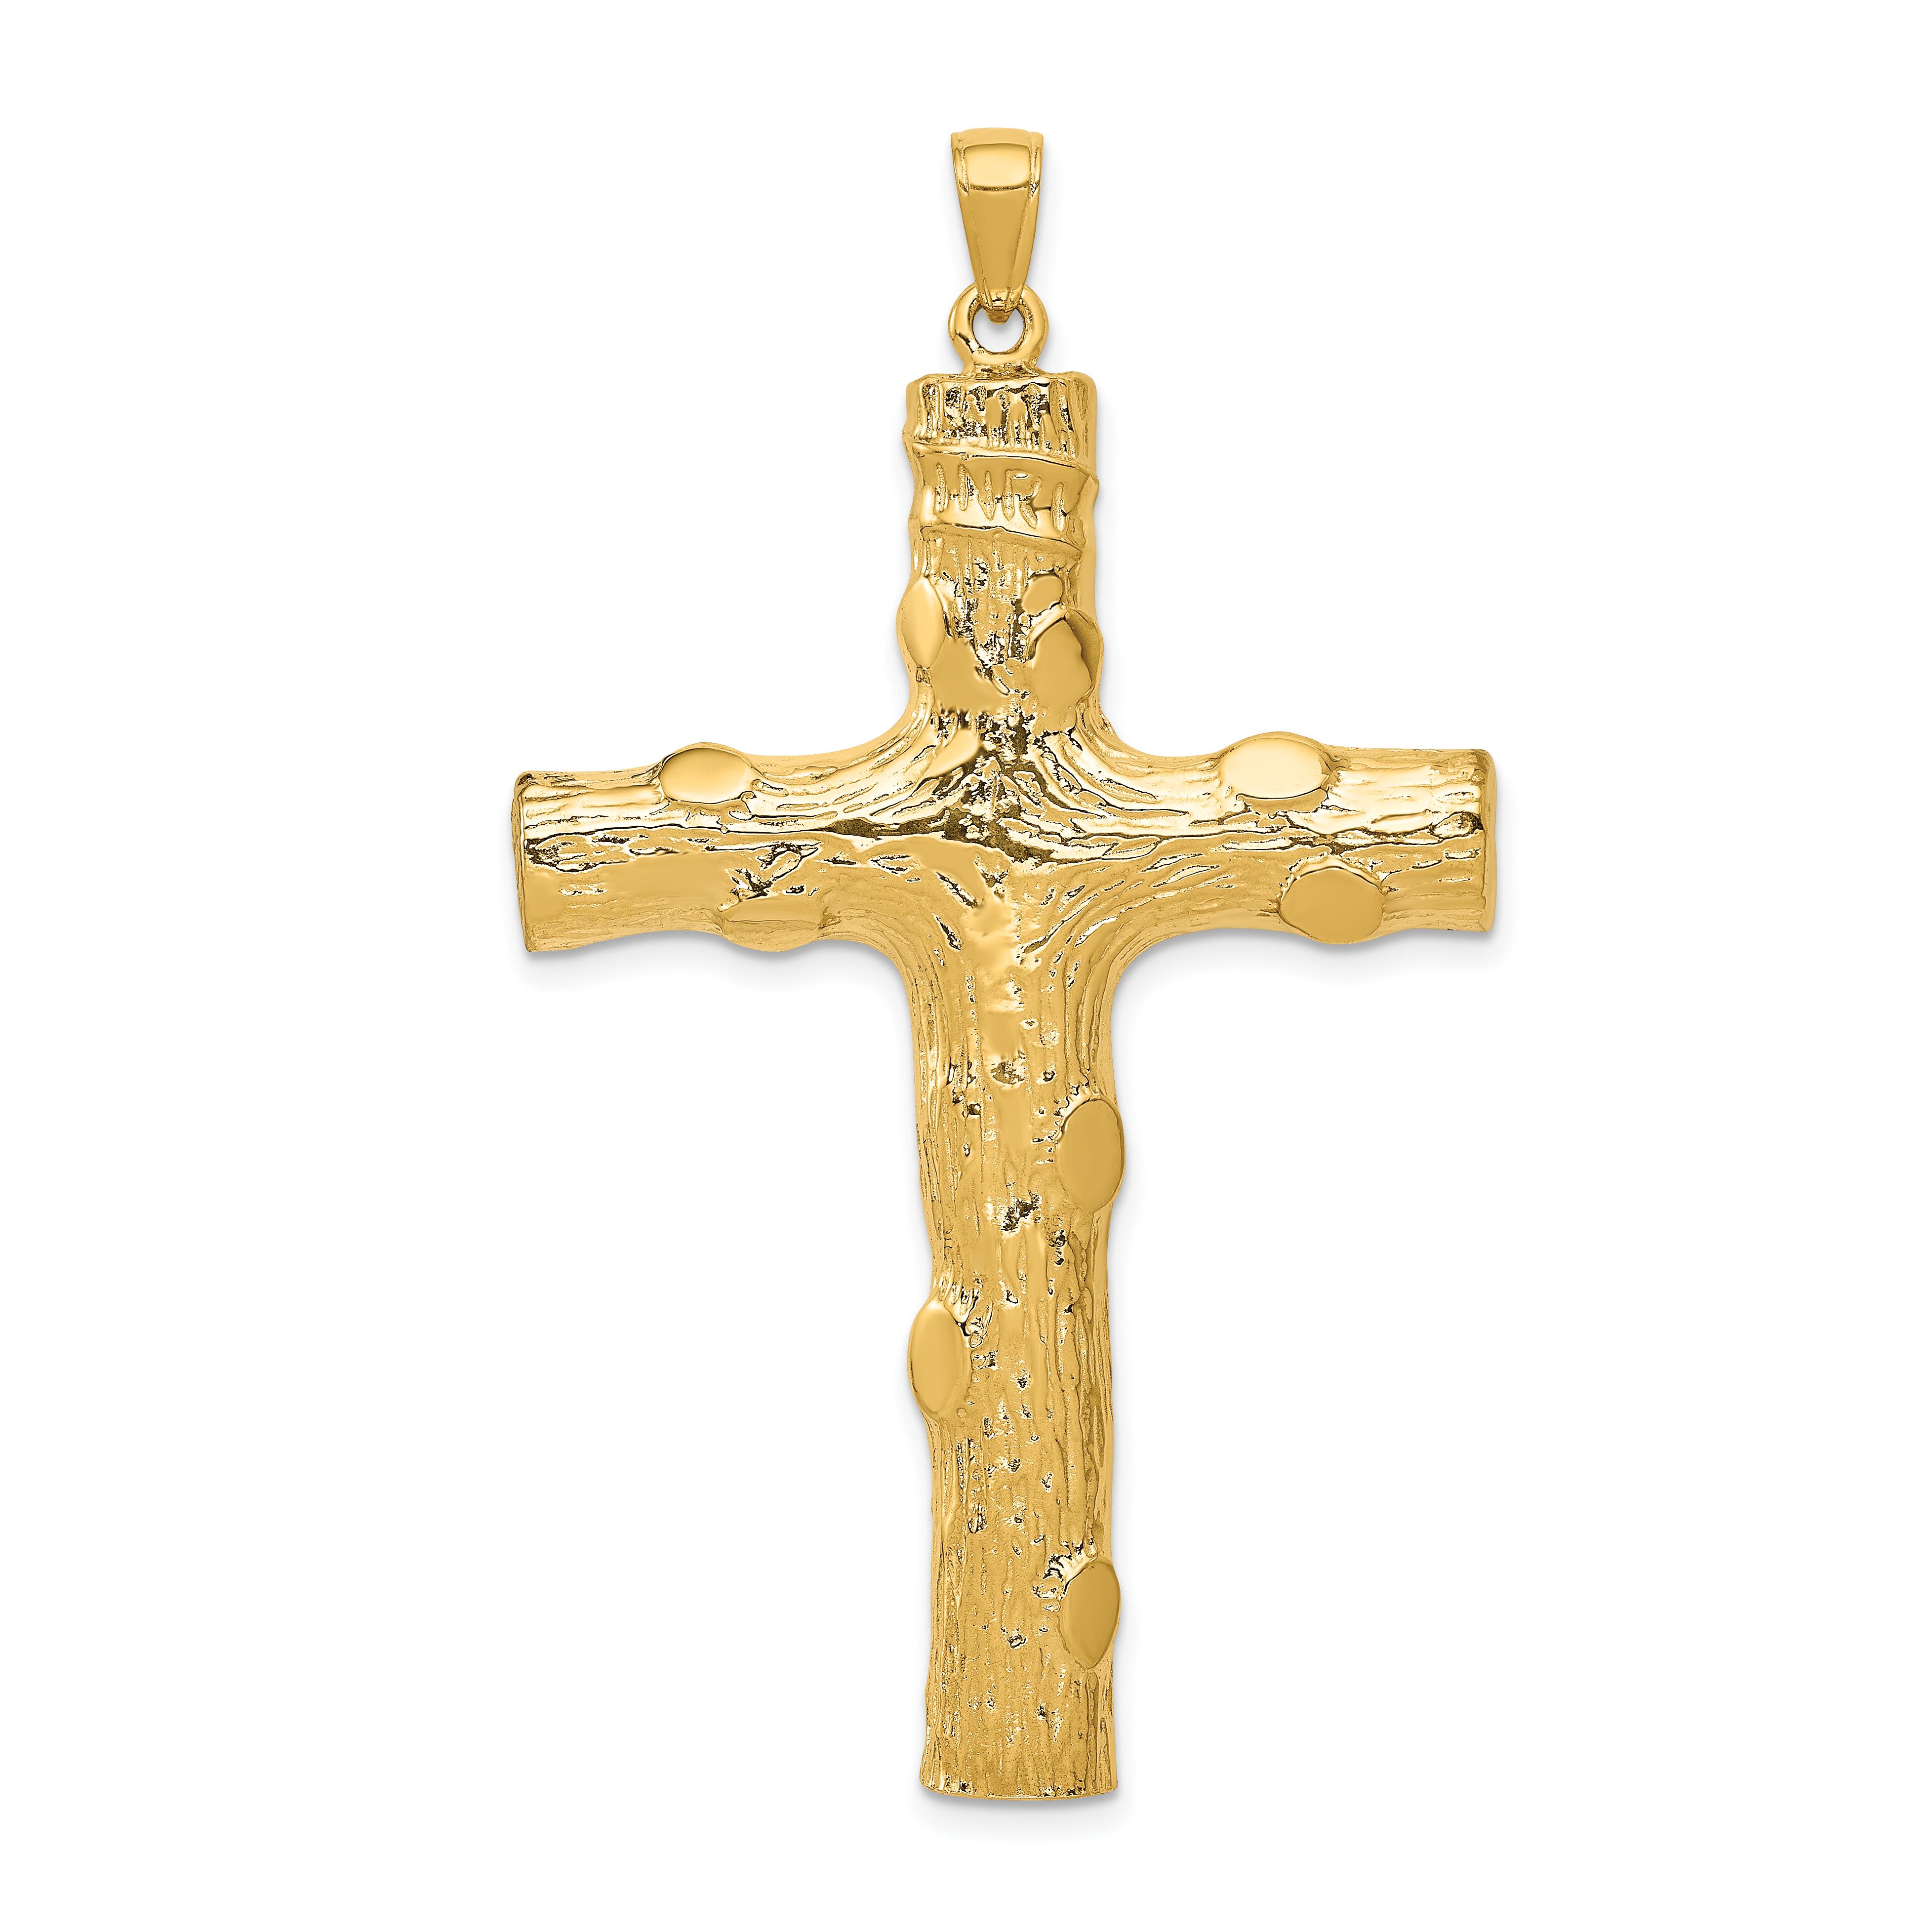 14k Yellow Gold Large Textured Cross Religious Pendant